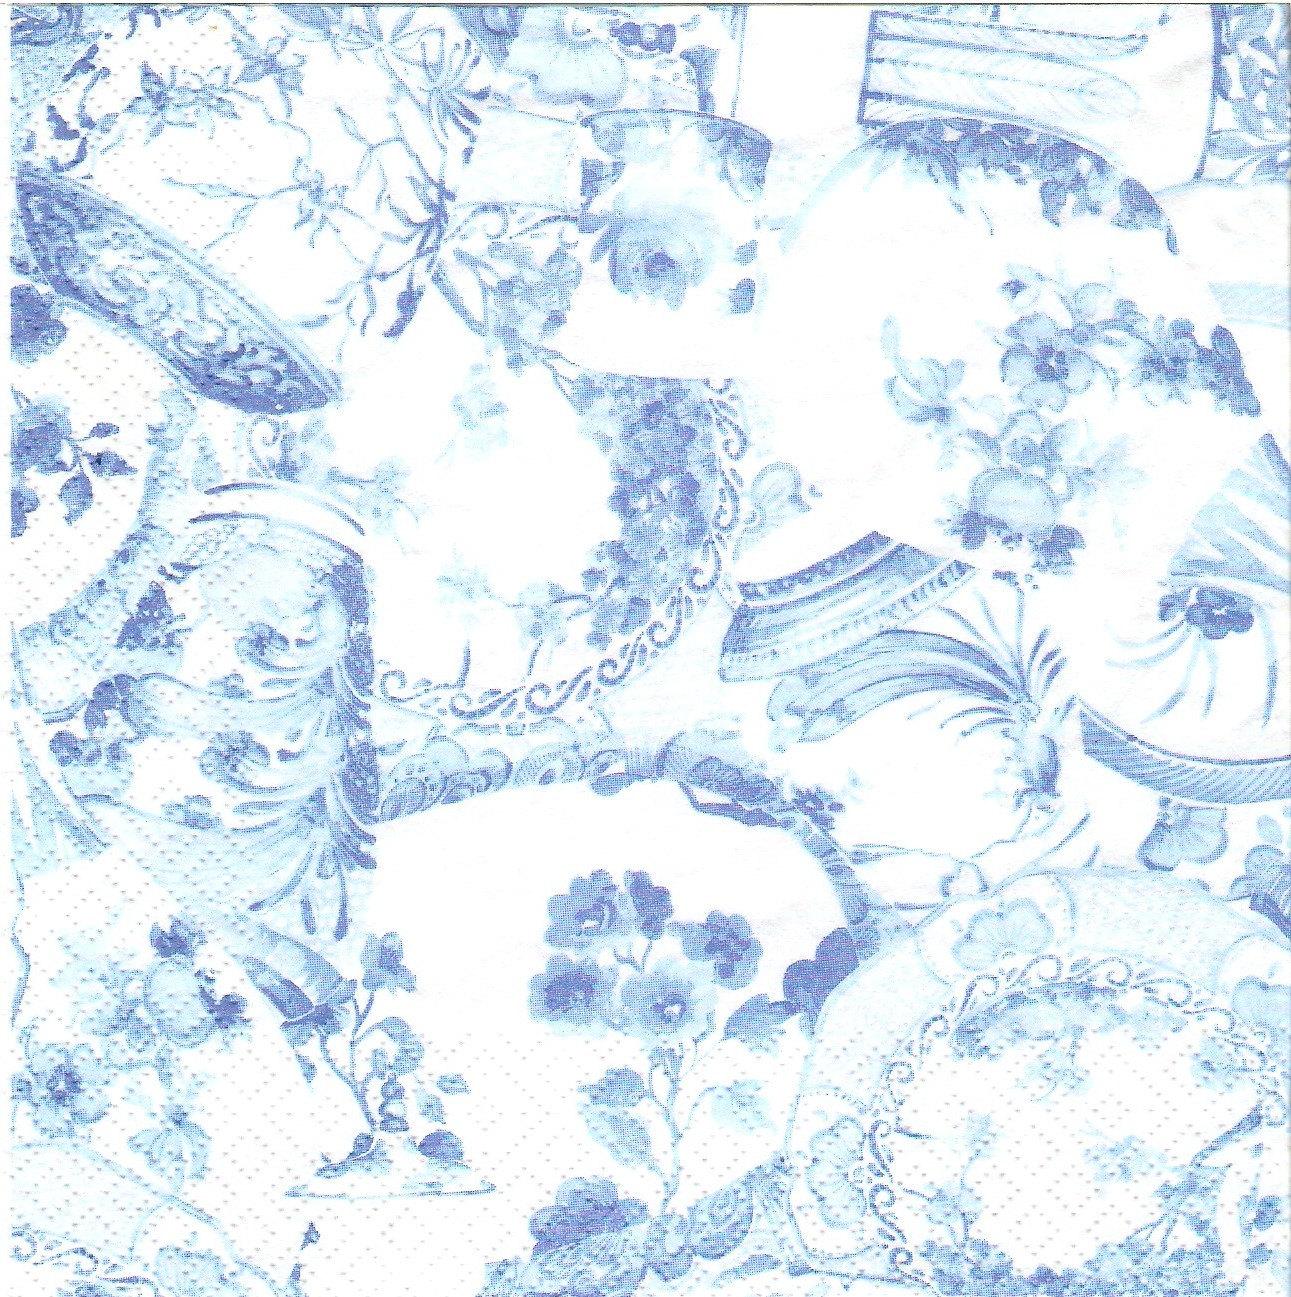 4 Blue Floral Pattern Decoupage Paper Napkins G032 Etsy